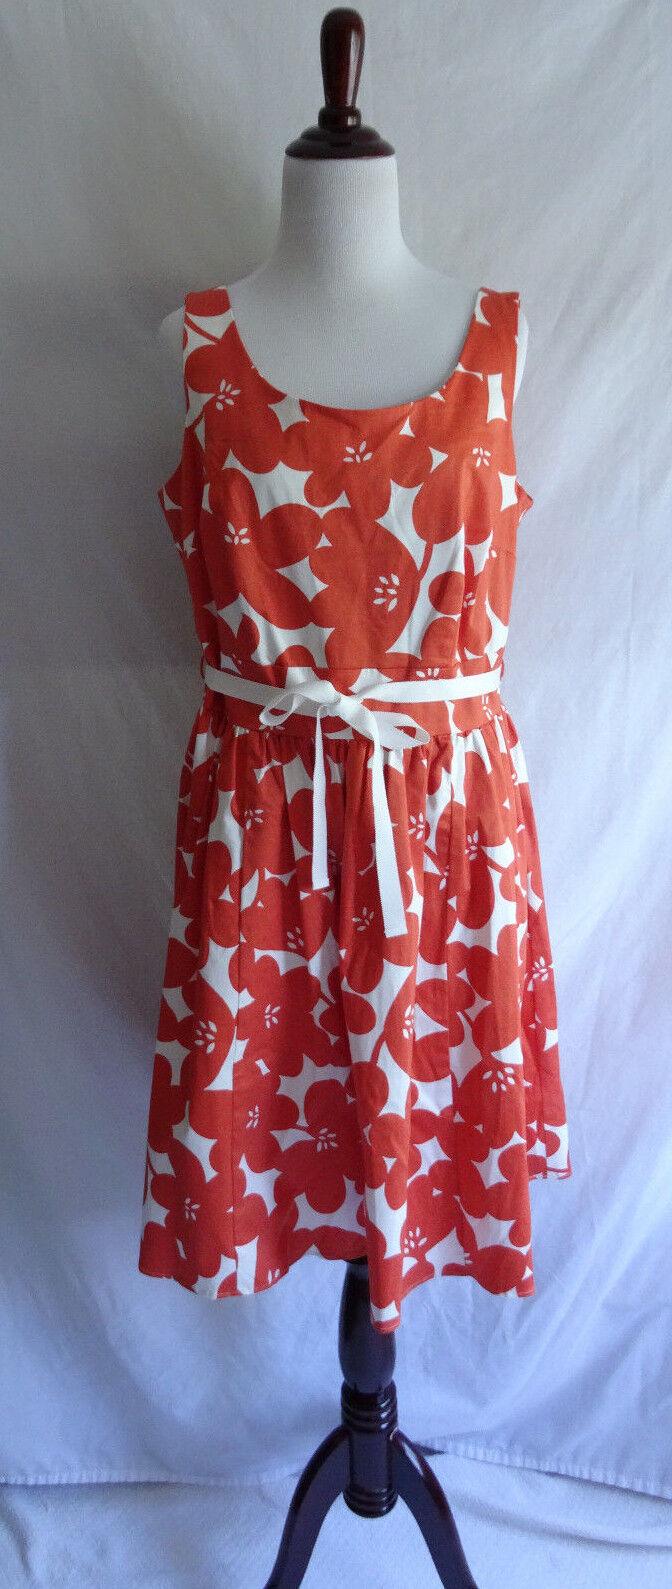 Boden 10 Orange Weiß Retro Flower Fit & Flare Marilyn Tea Dress Vtg. 50's Style